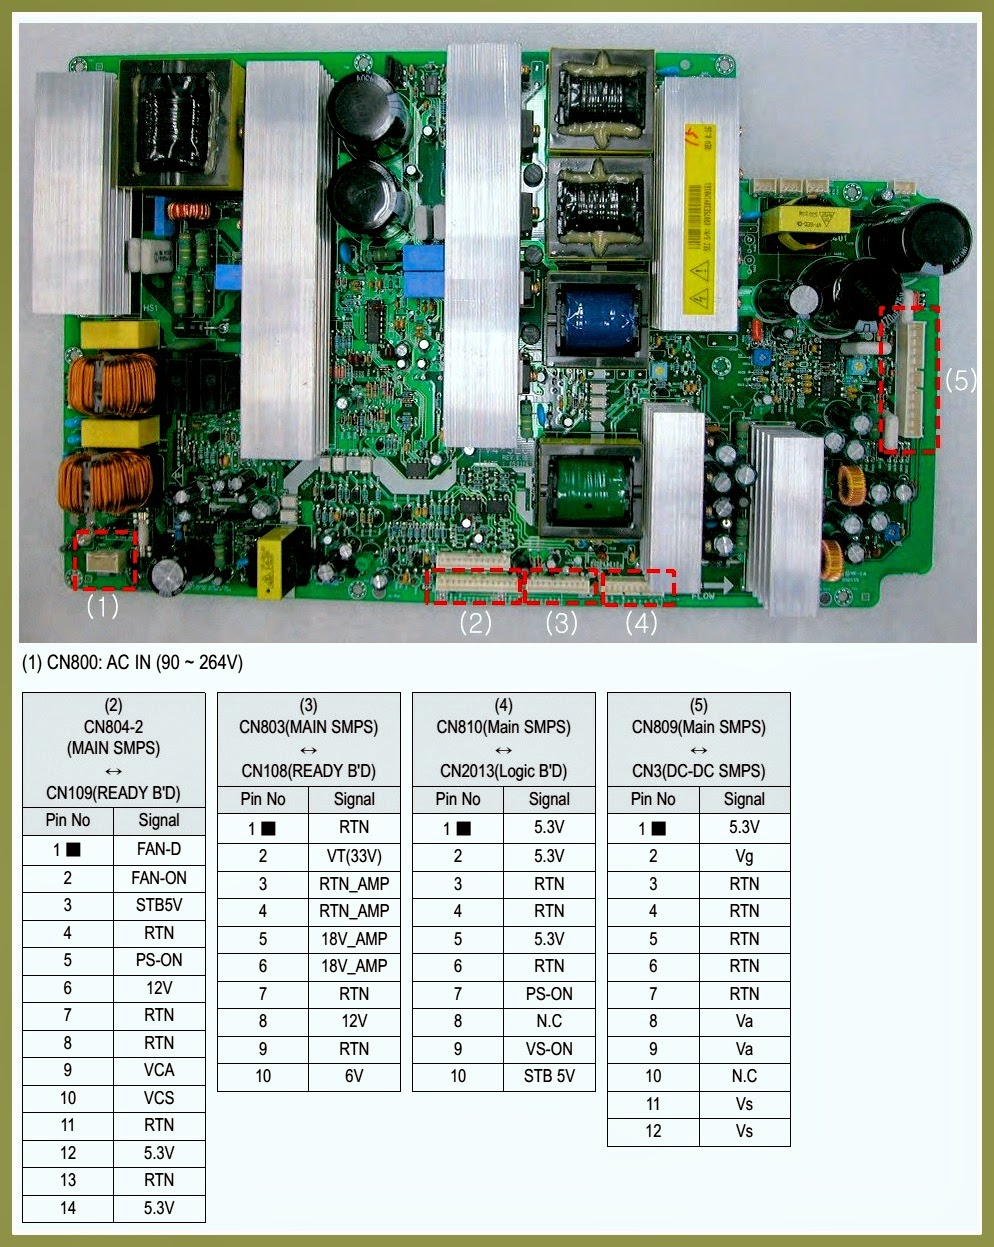 PS42D - SAMSUNG PLASMA DISPLAY SMPS - VOLTAGES - DETAILS | Electro help